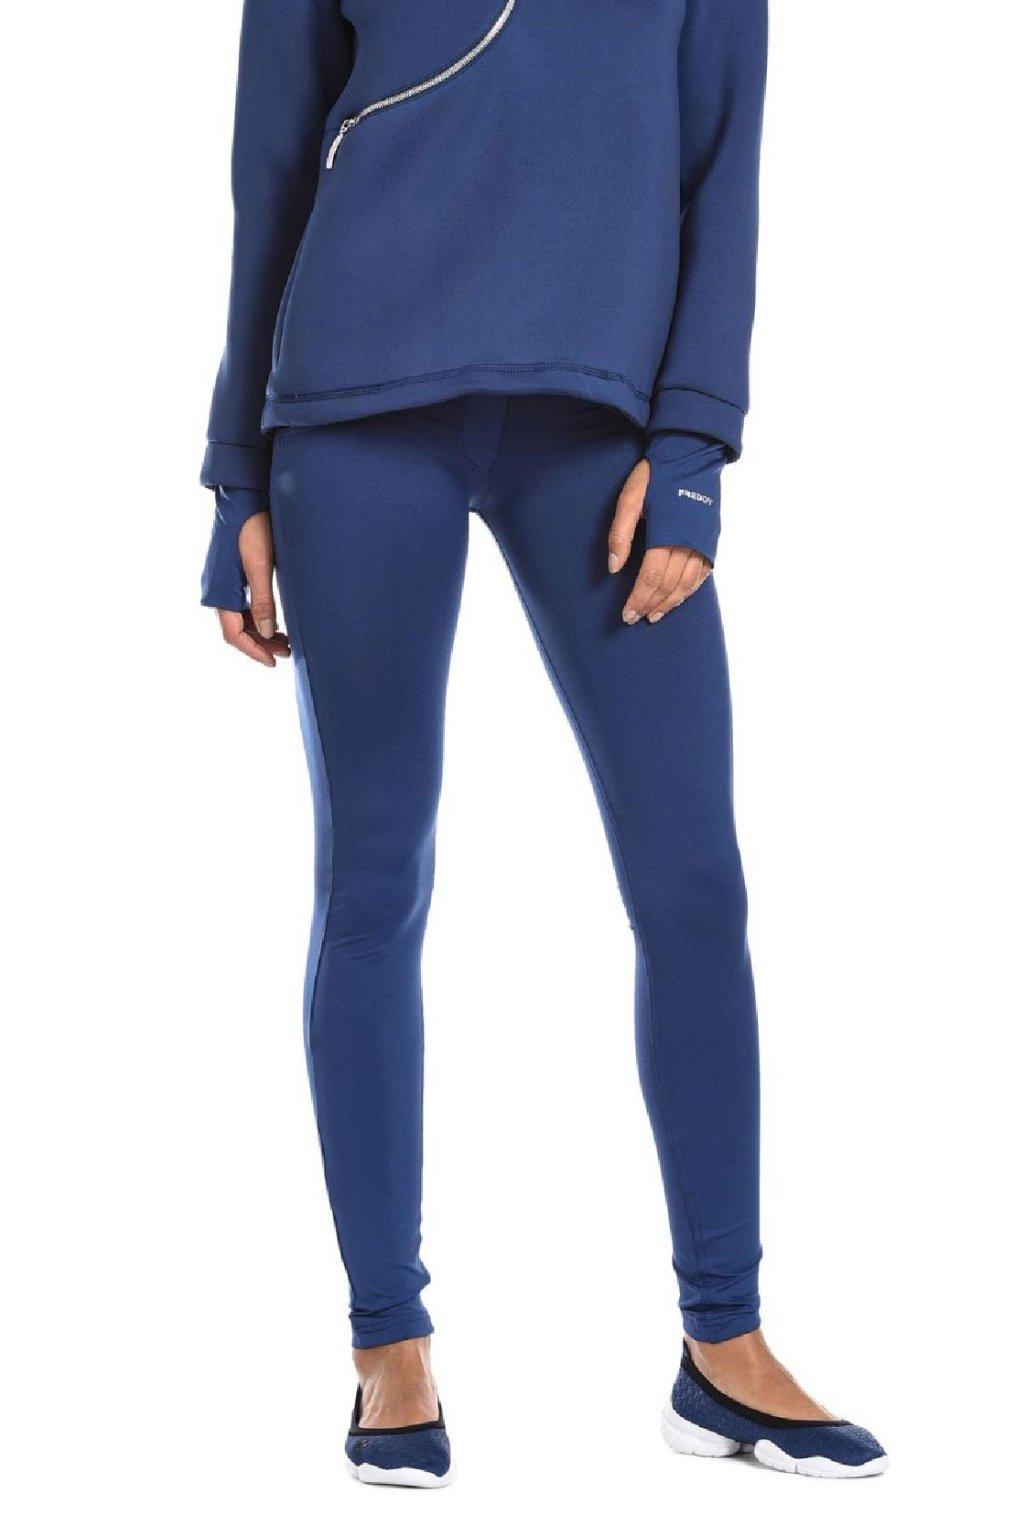 Freddy kalhoty blu DIWO push up kalhoty skinny nizky pas freddy jeans wr up znackove leginy modre sportovni leginy slevovy kod znackove obleceni freddy sleva freddy normalni pas vysoky pas freddy brno sexyjeans (3)